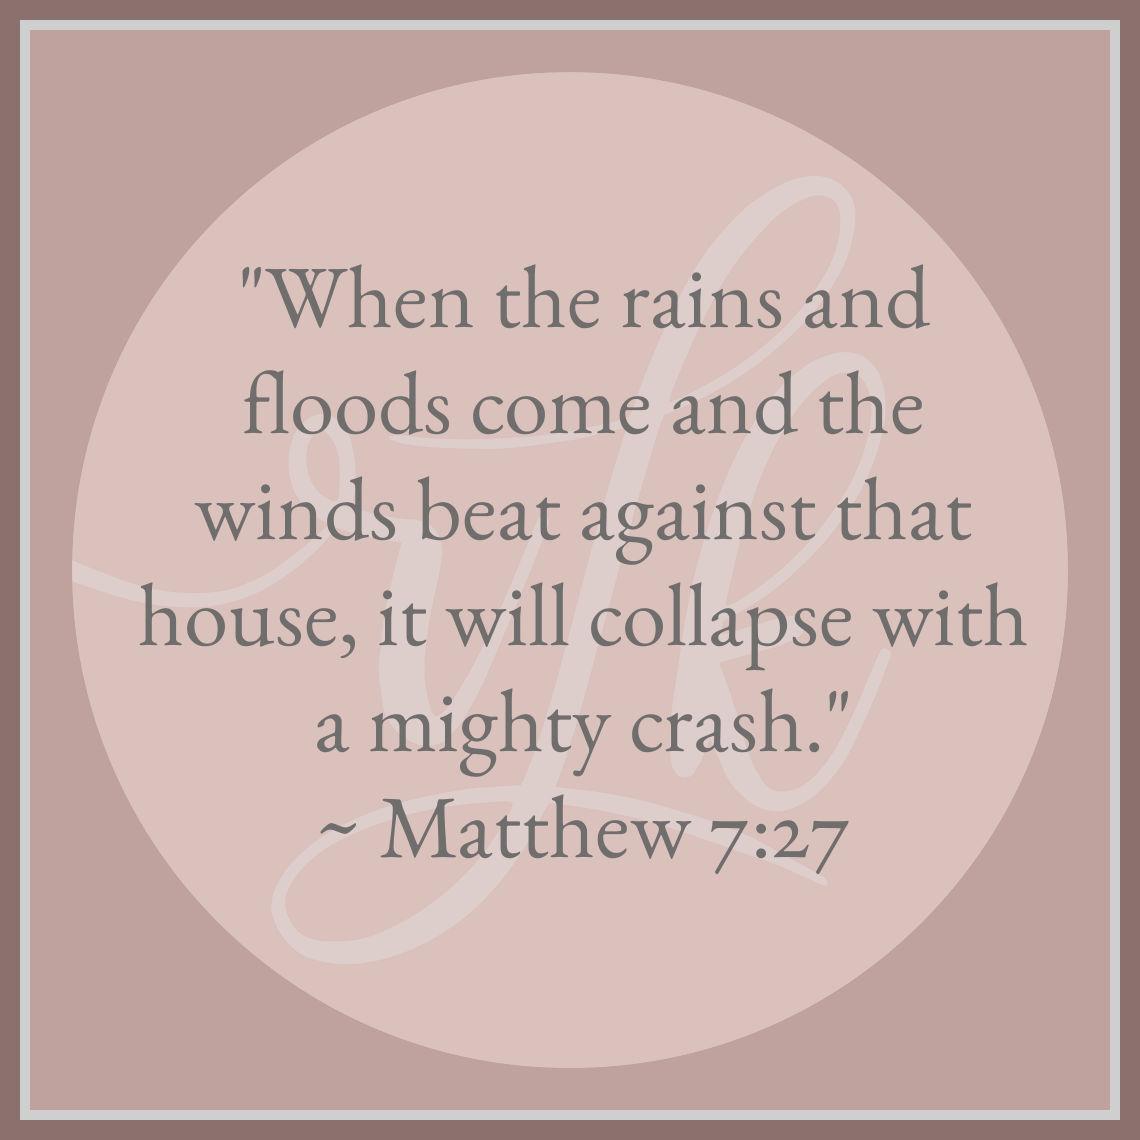 Matthew 7:27